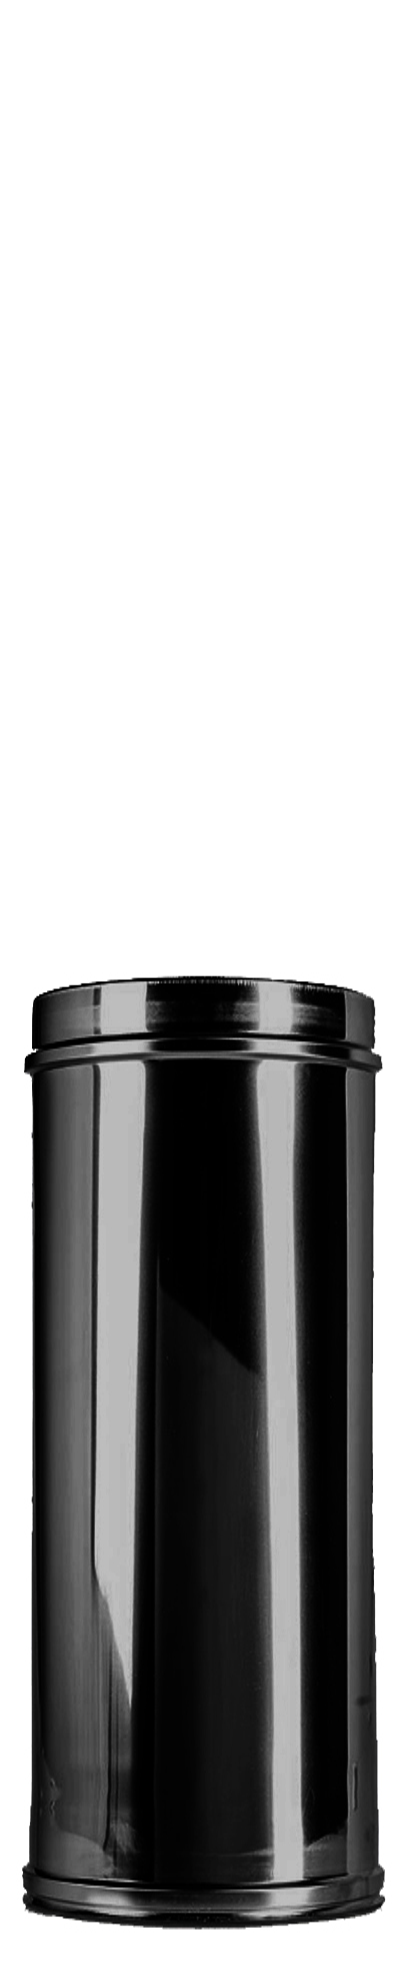 l-ngenelement-300-mm-schwarz